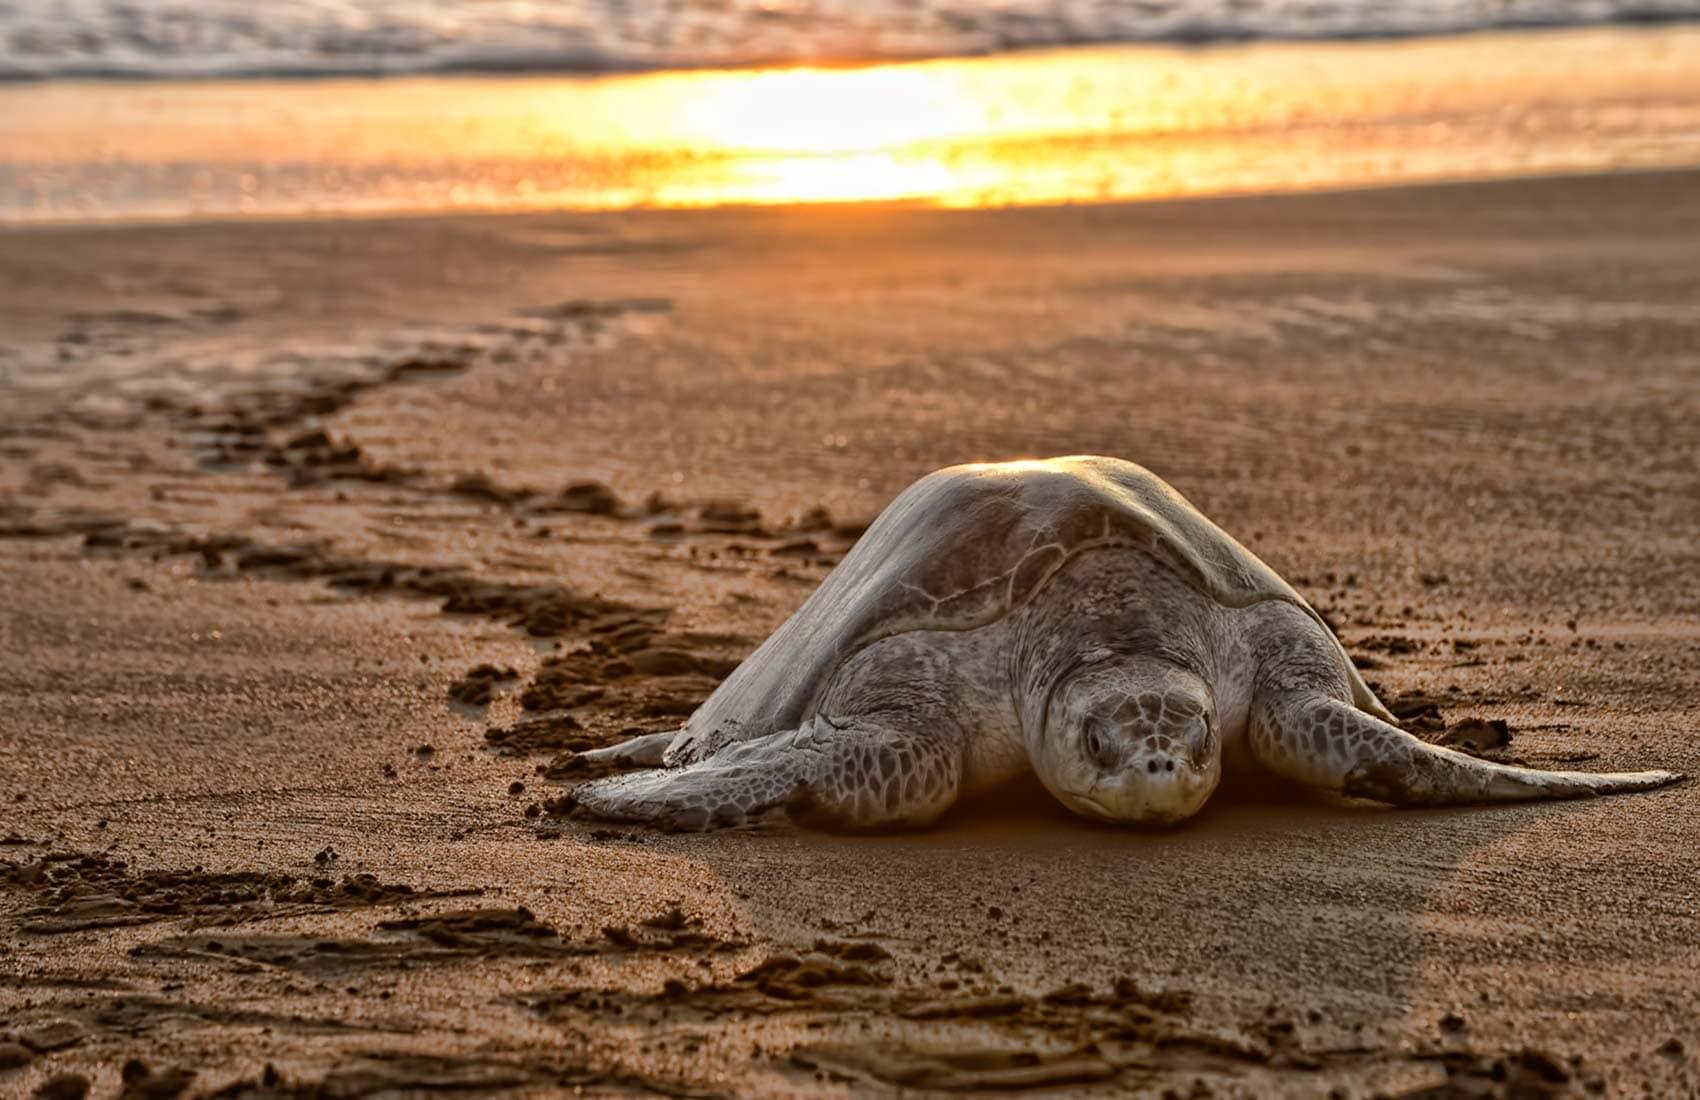 nidification-tortue-costa-rica-decouverte